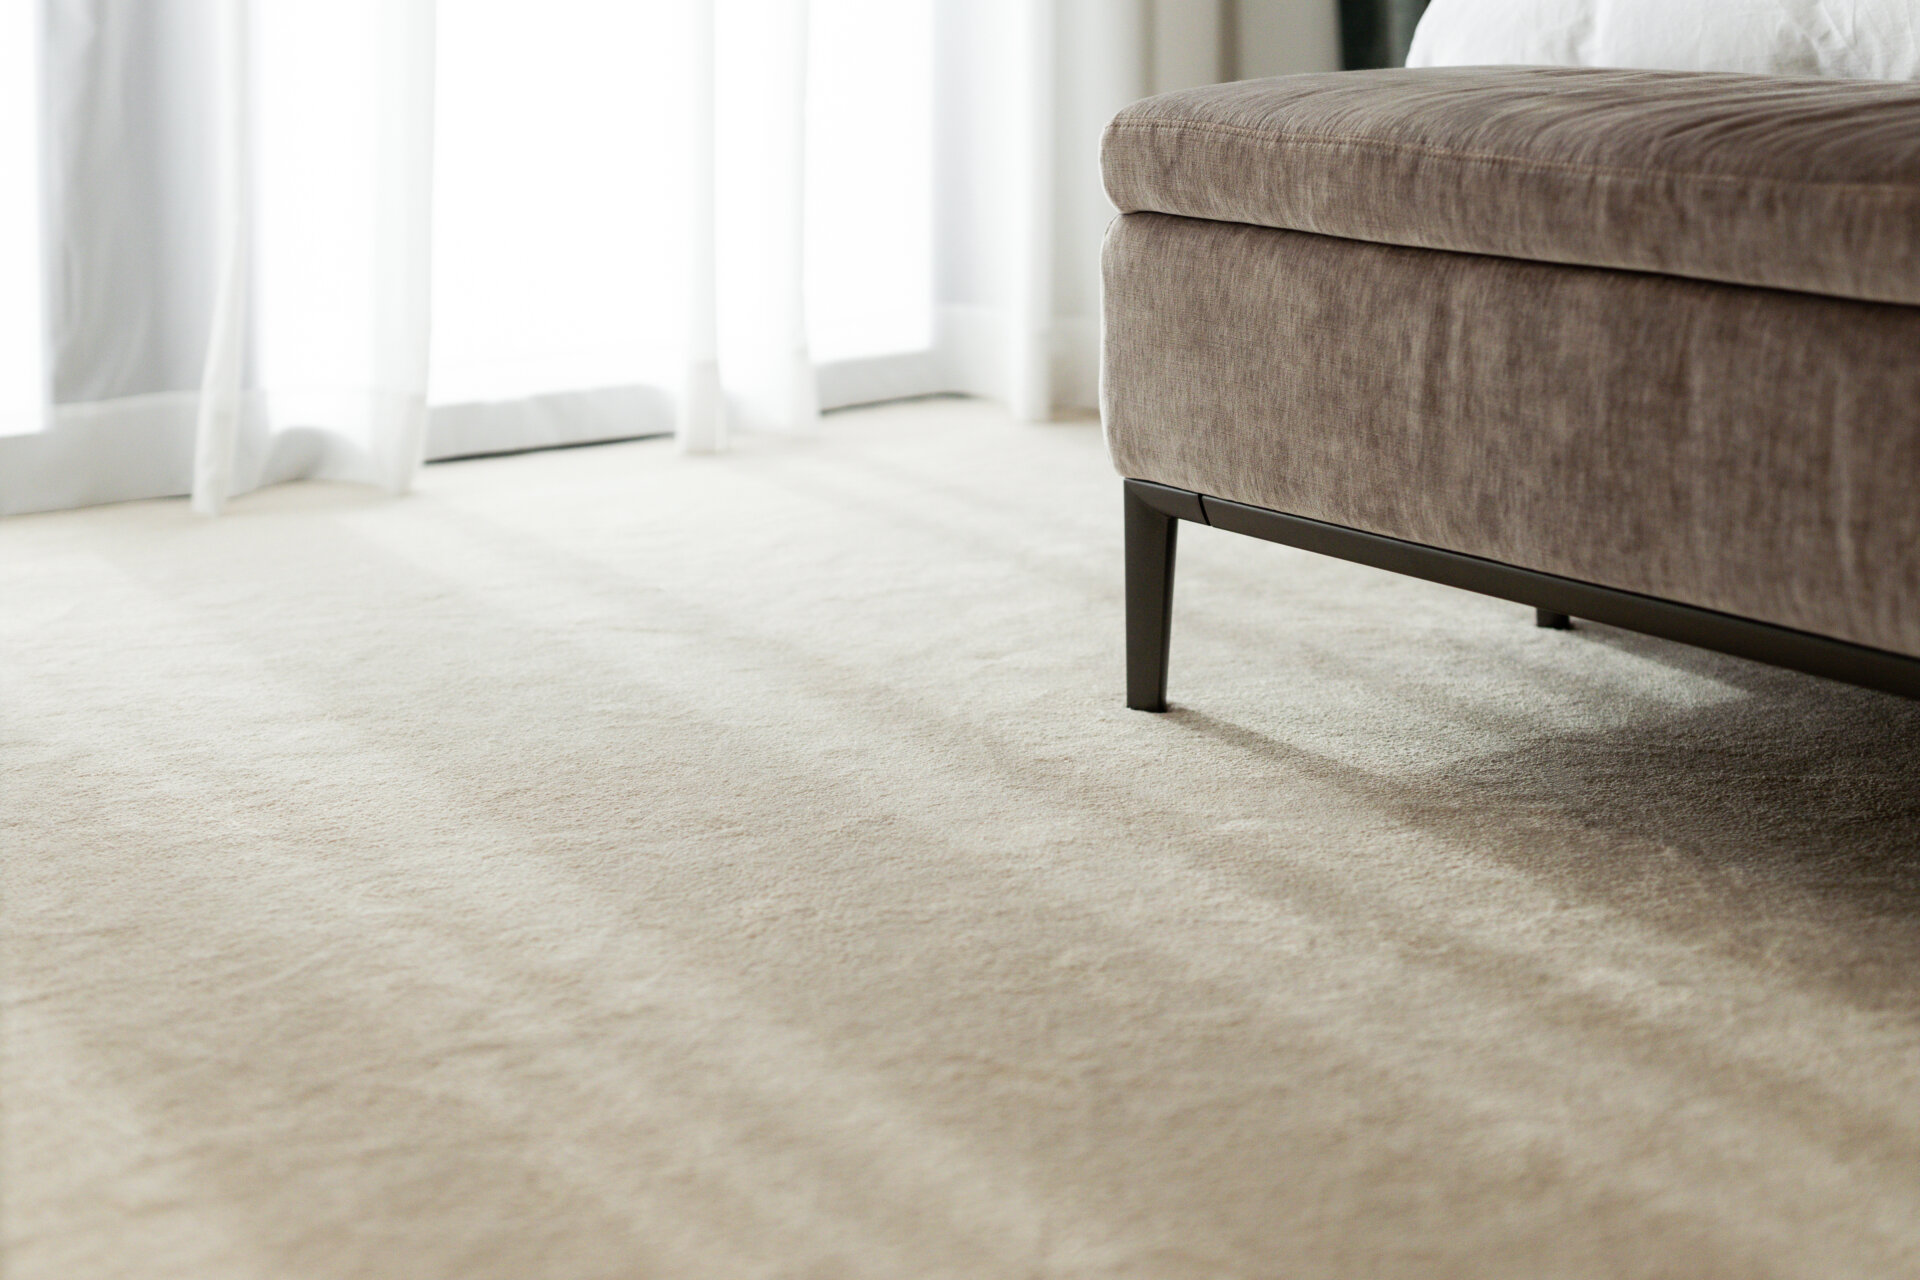 20210303-carpet&more-vila-bogdan-craiova-by-hugmedia-35